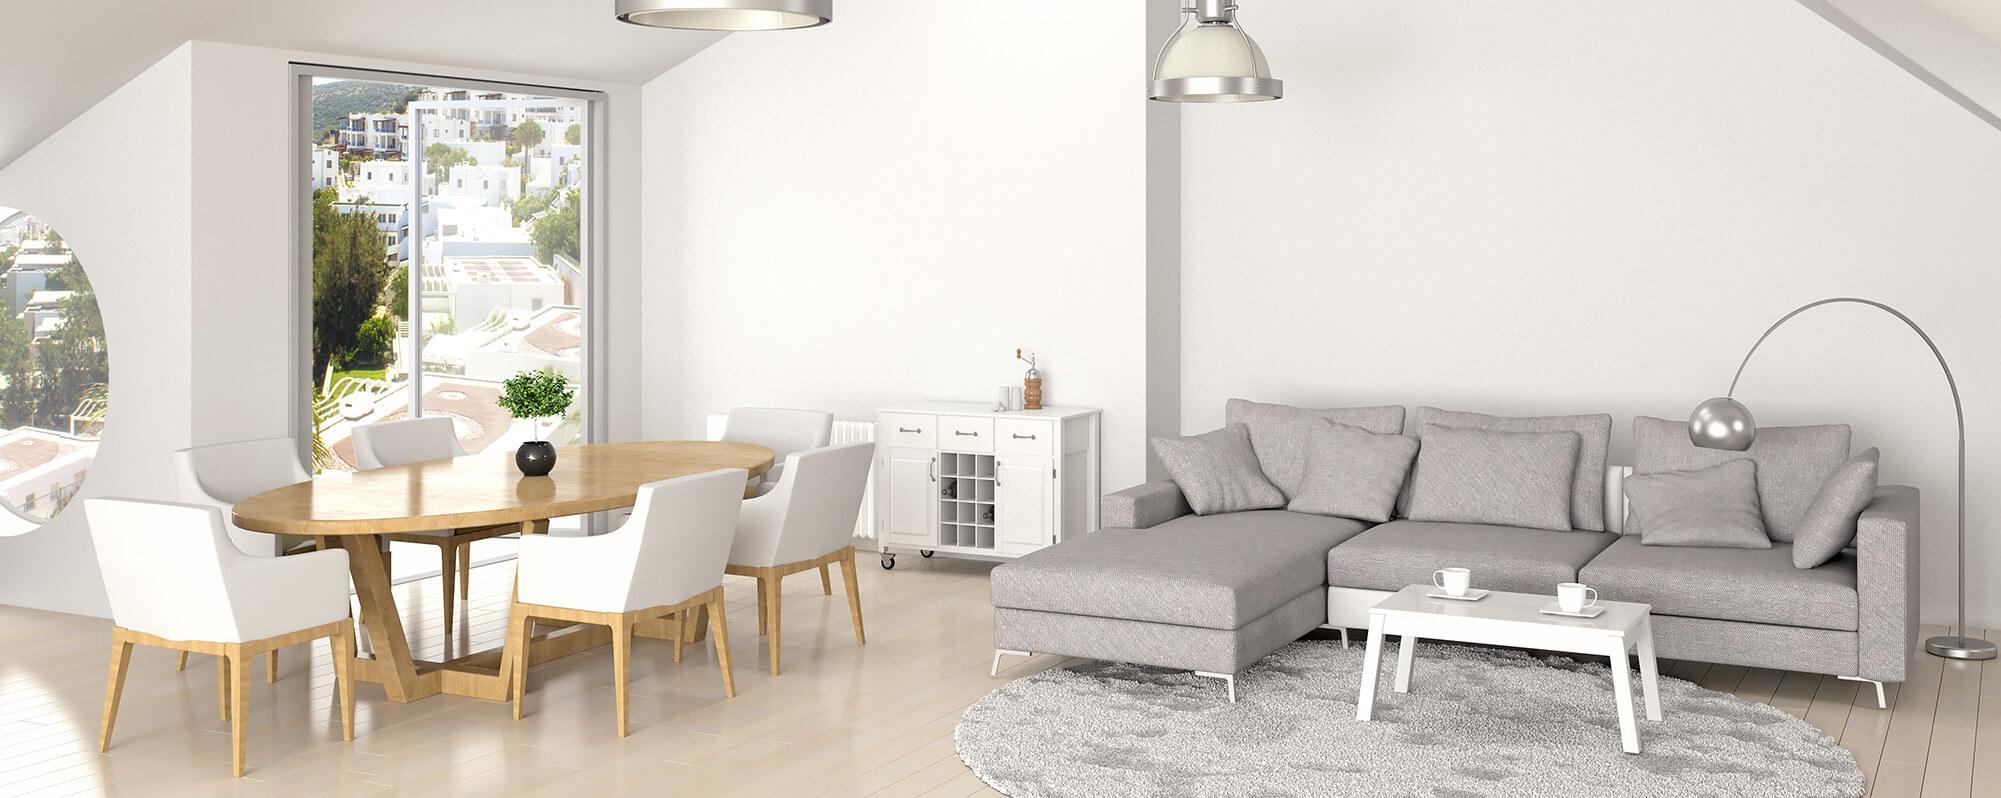 Urban living solutions residential home design dual for Urban living room design